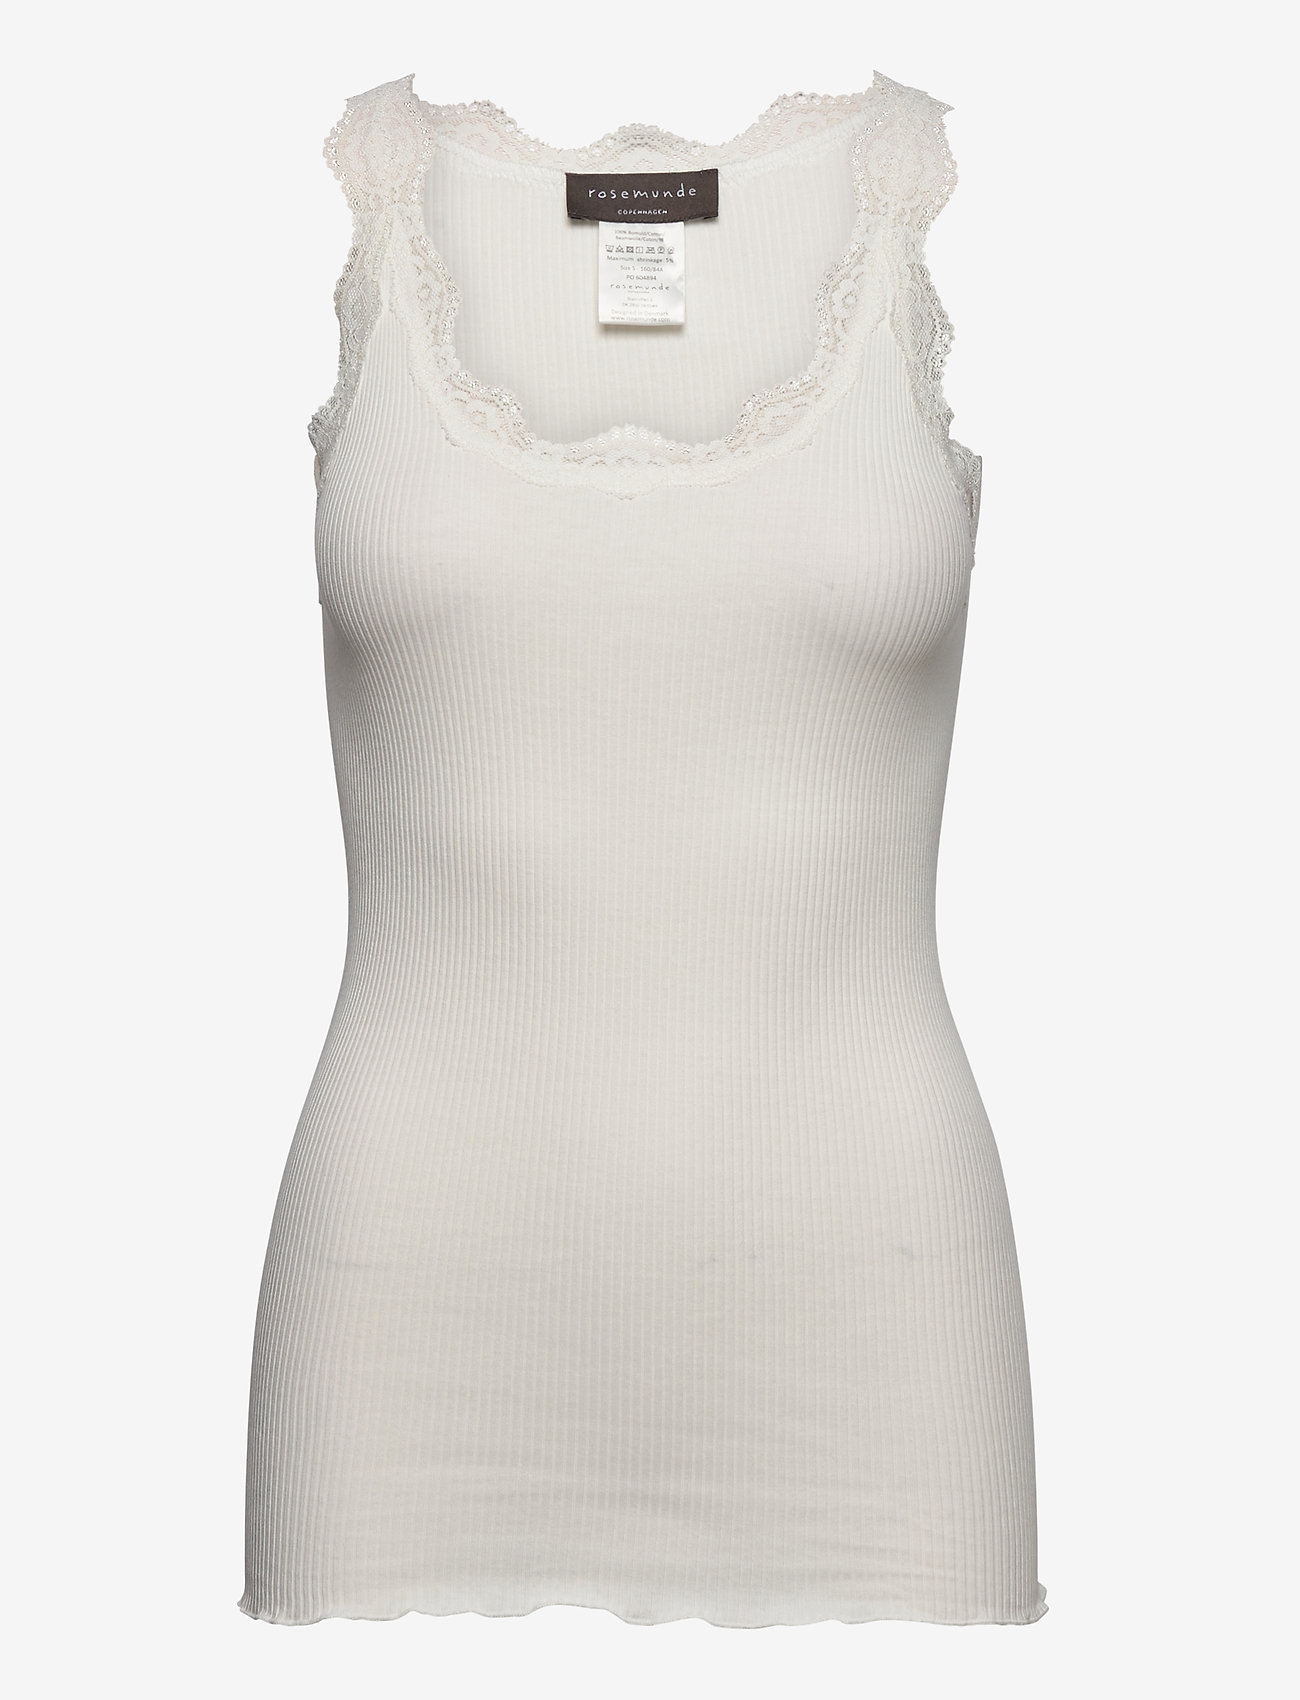 Rosemunde - Organic top w/ lace - linnen - ivory - 0